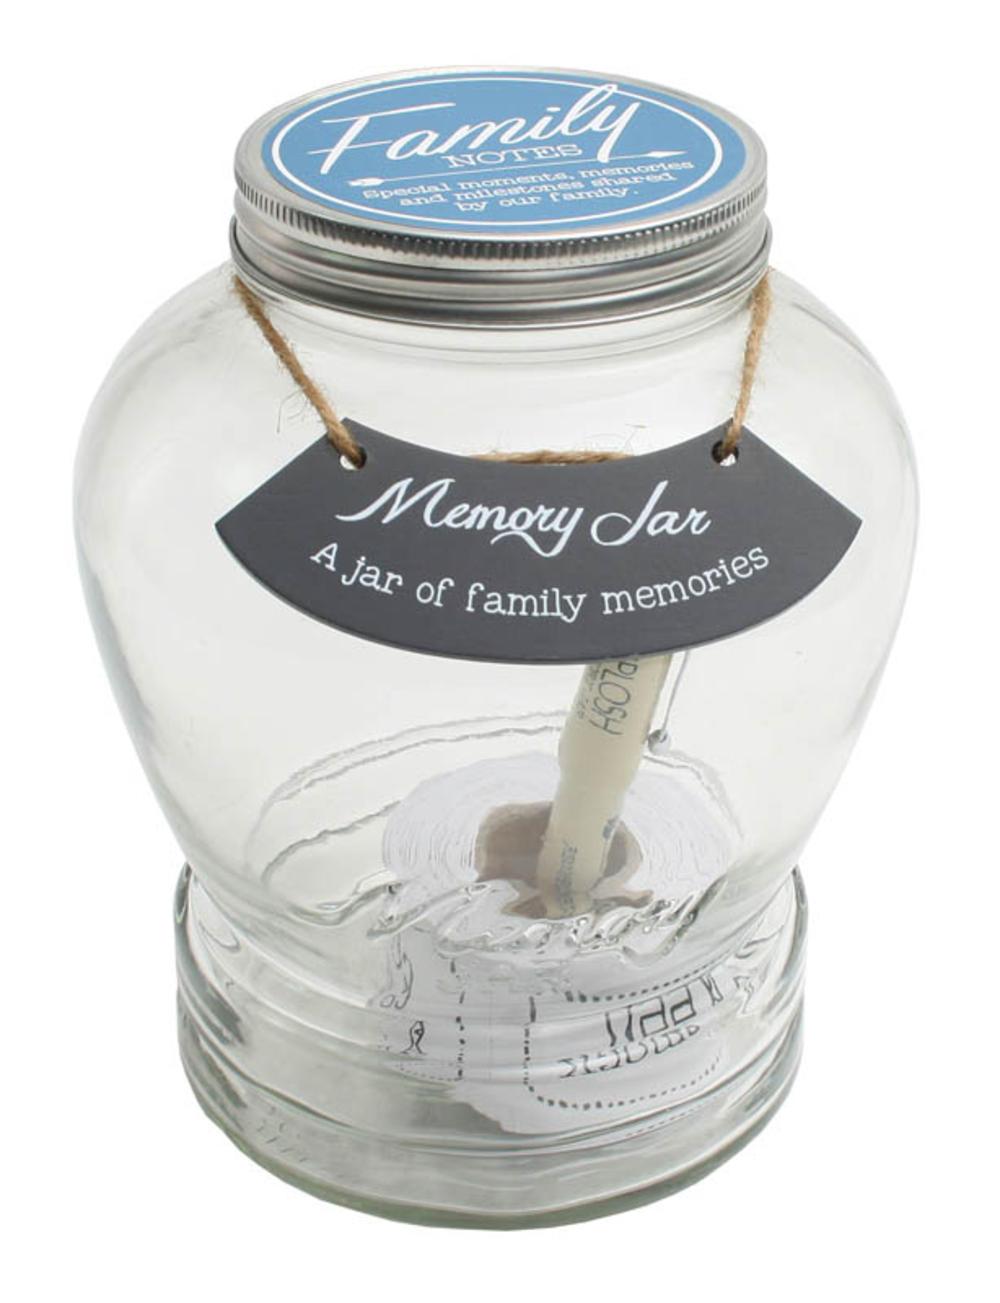 splosh family notes memory jar gift idea anniversary gifts love